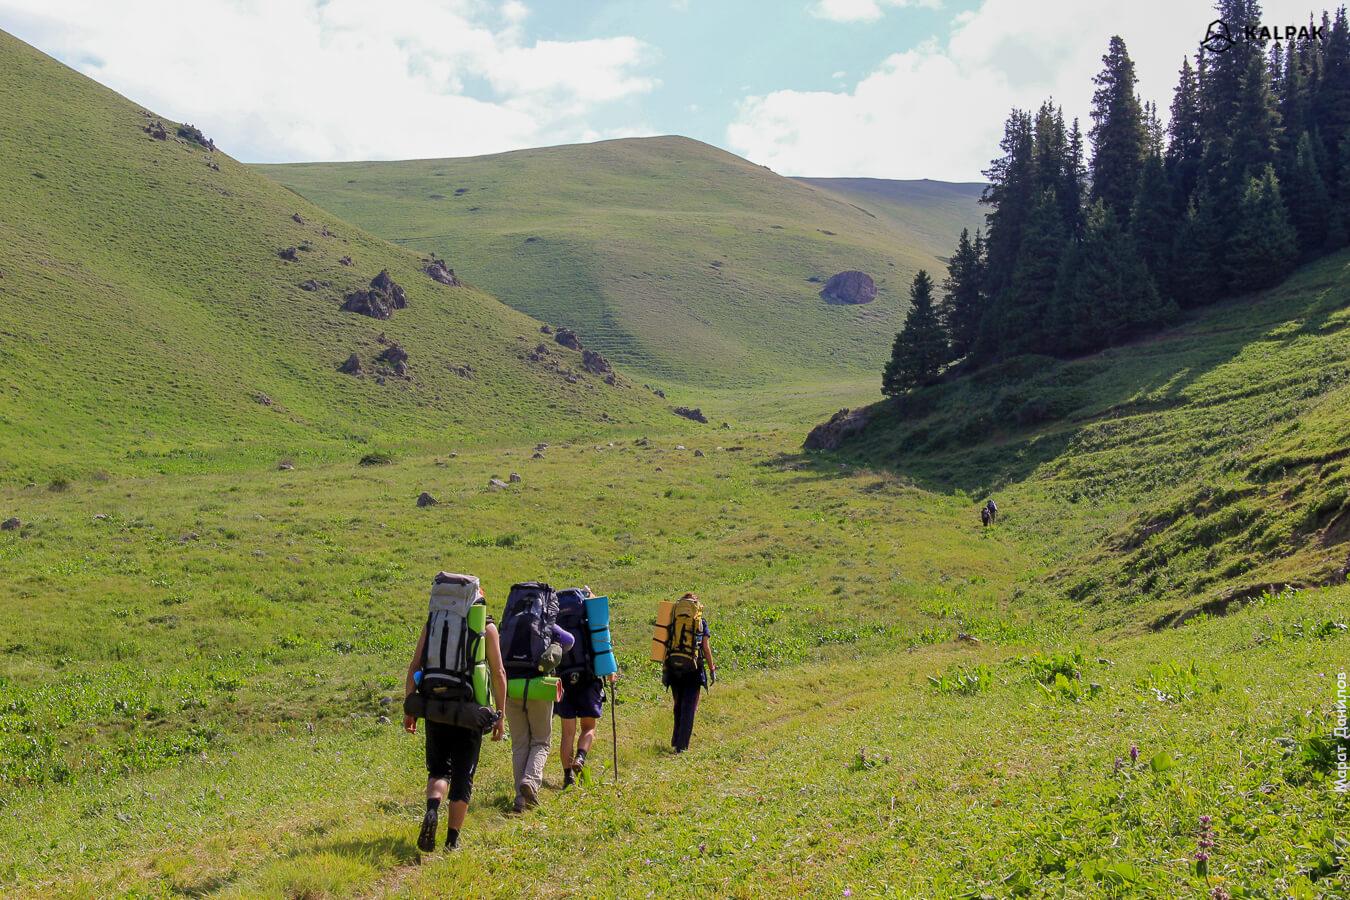 Central Asia Trekking - Packing List